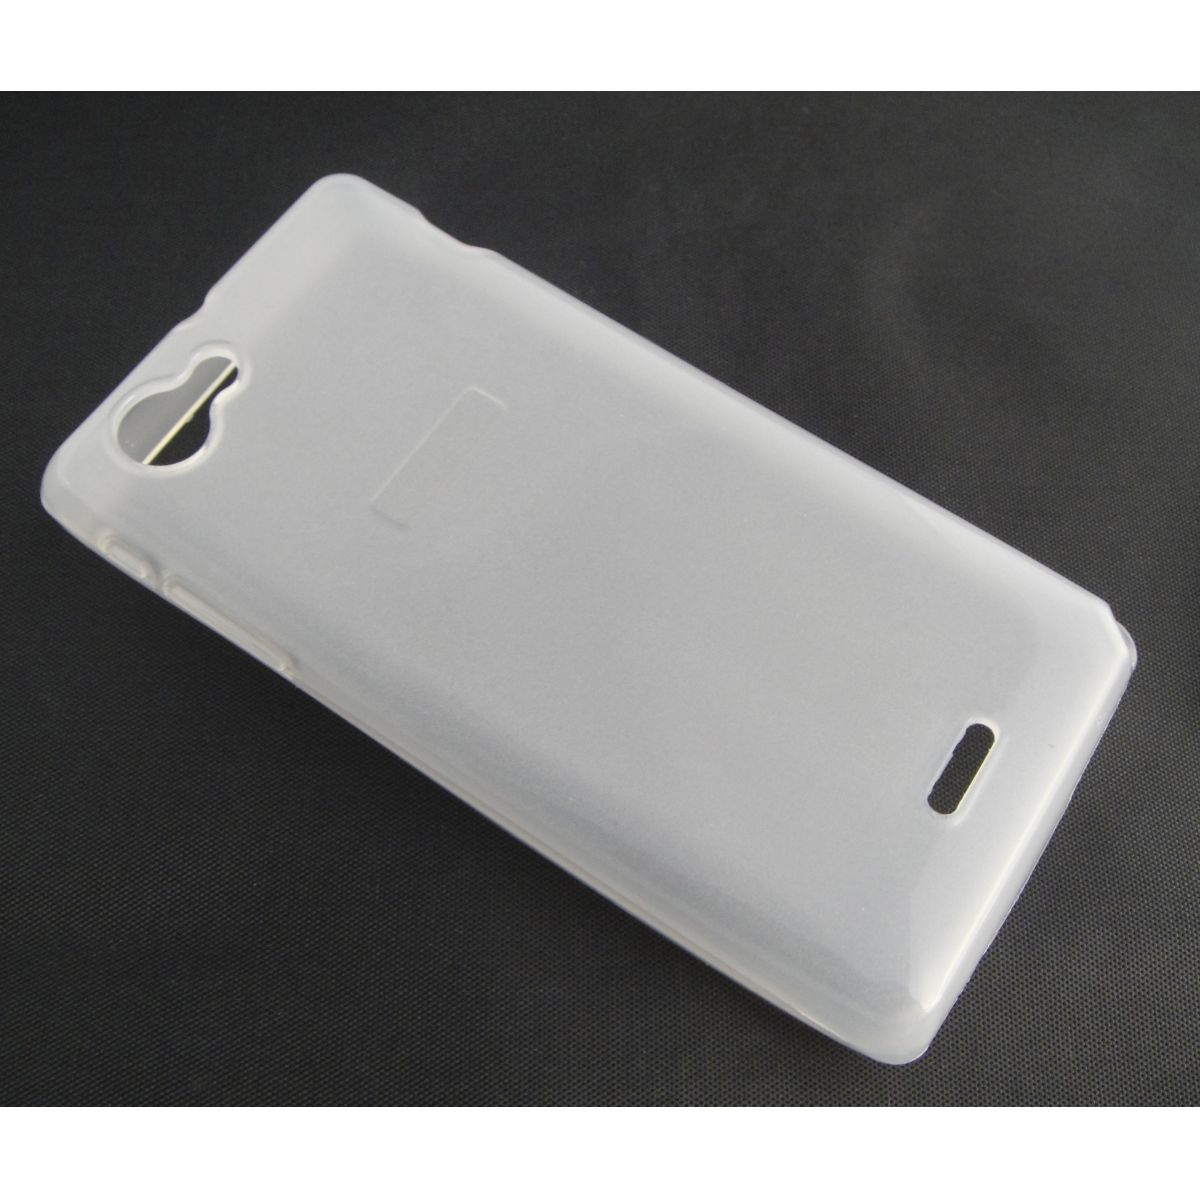 Capa TPU Transparente Sony ST26i Xperia J + Película Flexível